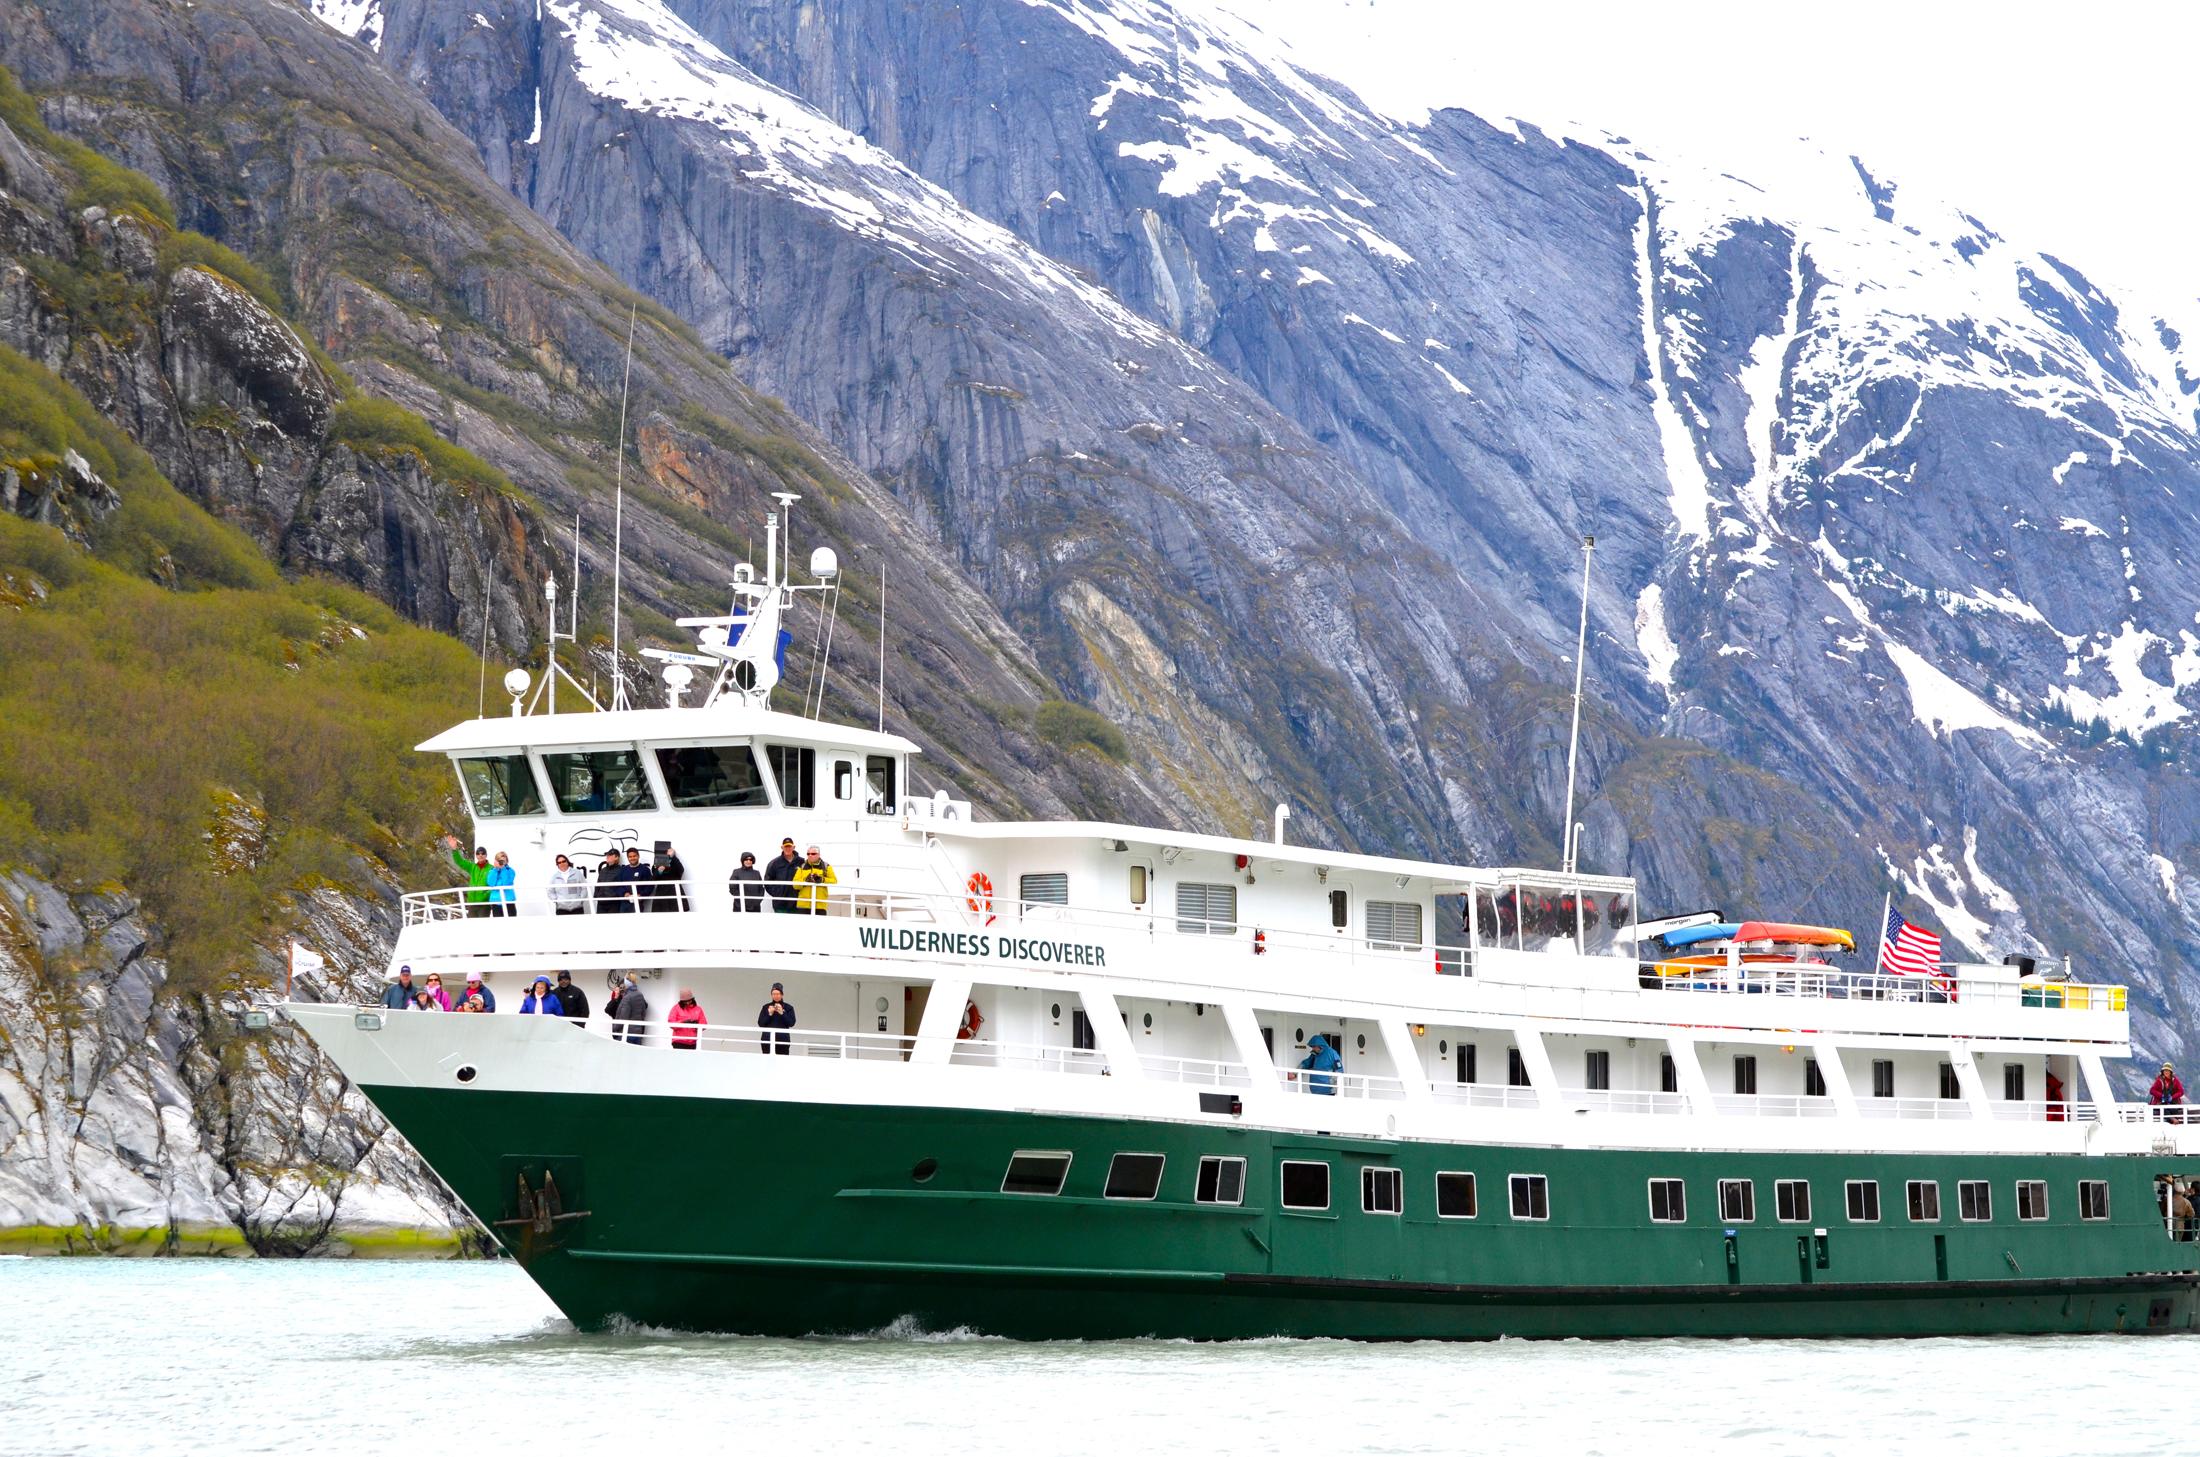 Uncruise's Wilderness Discoverer cruise ship